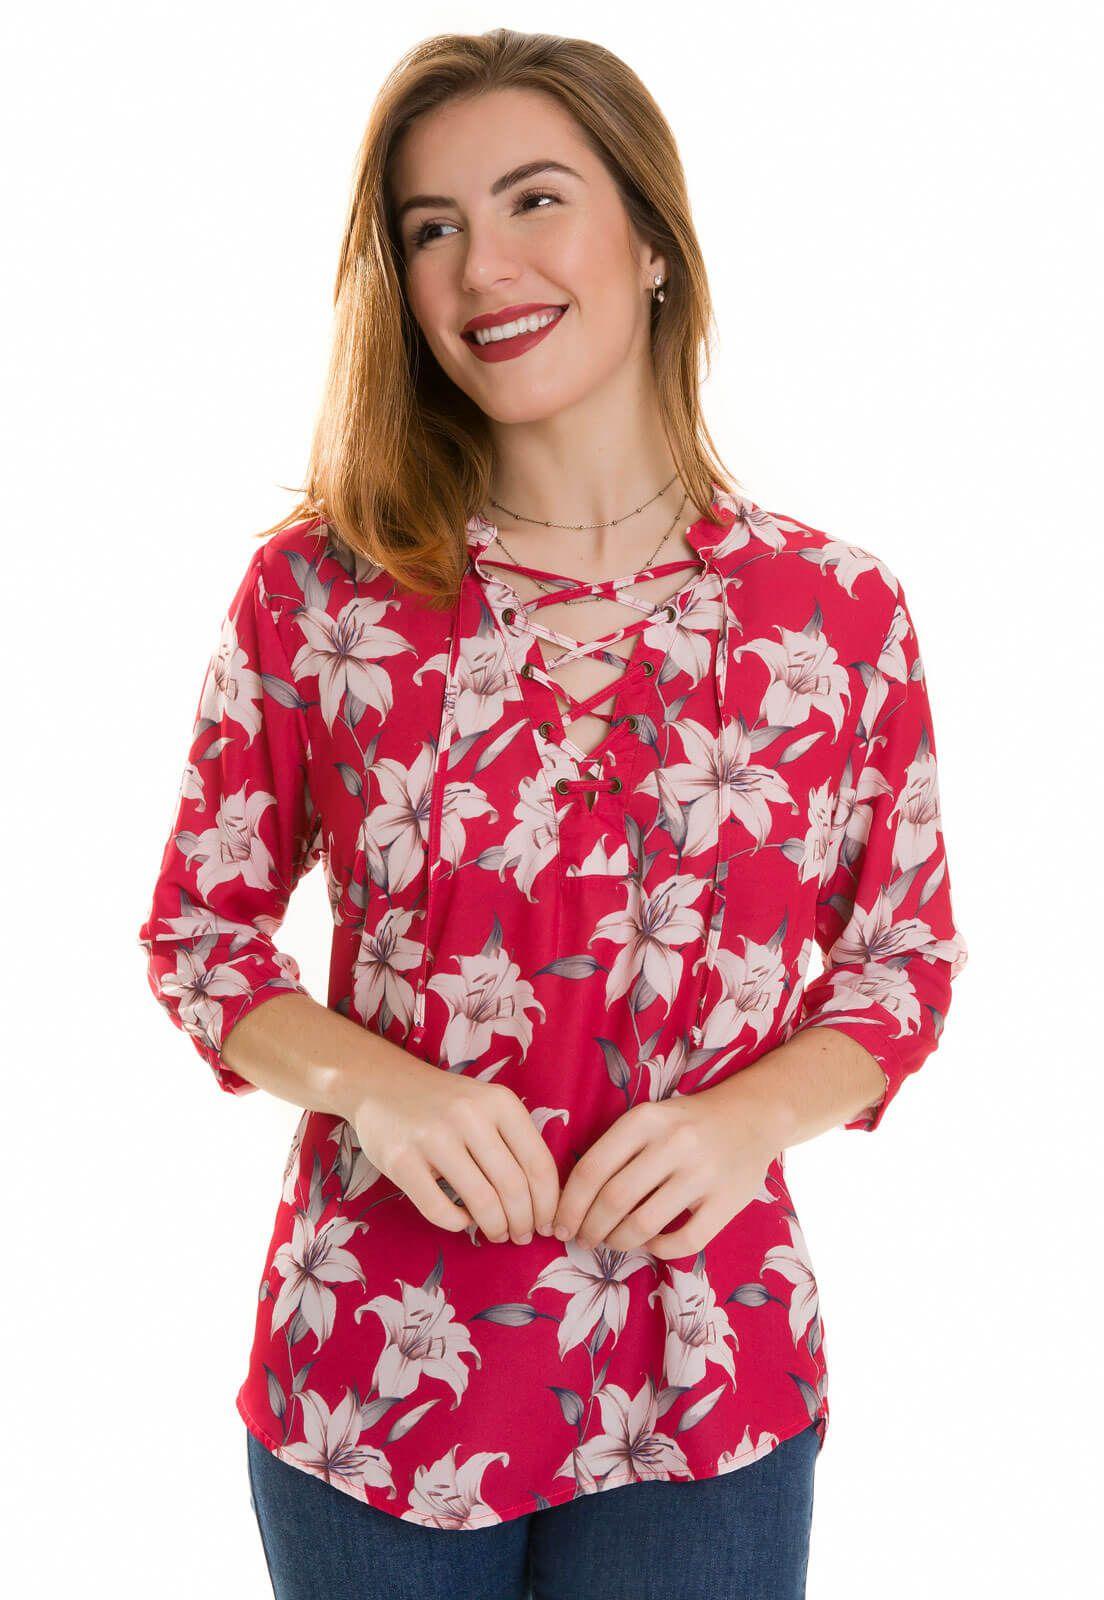 Camisa Camisete Feminino Olimpo Crepe Floral Manga ¾ Vermelha